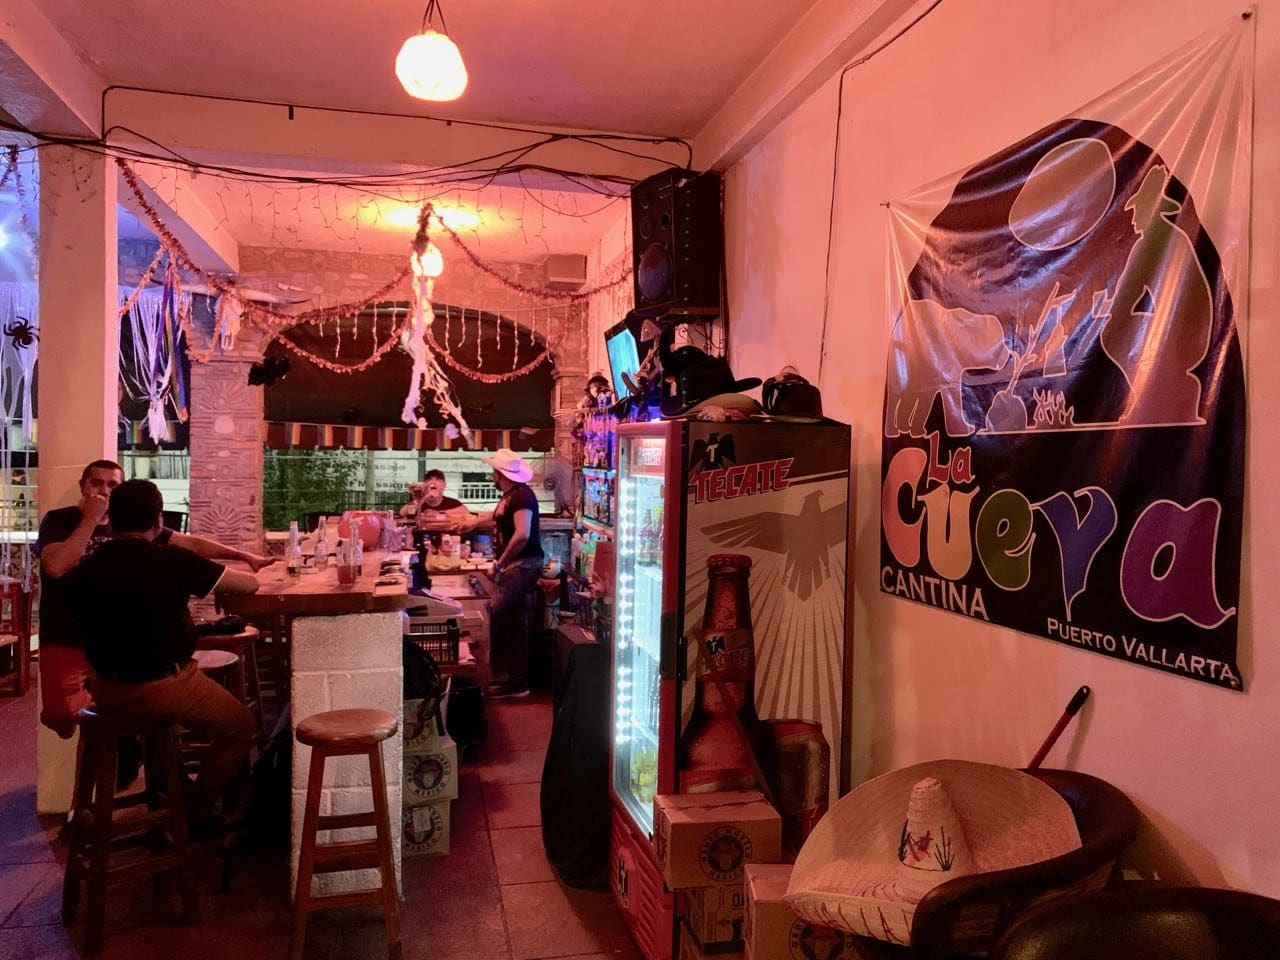 Gay Bars Puerto Vallarta: Enjoy a classic Mexican cantina vibe.